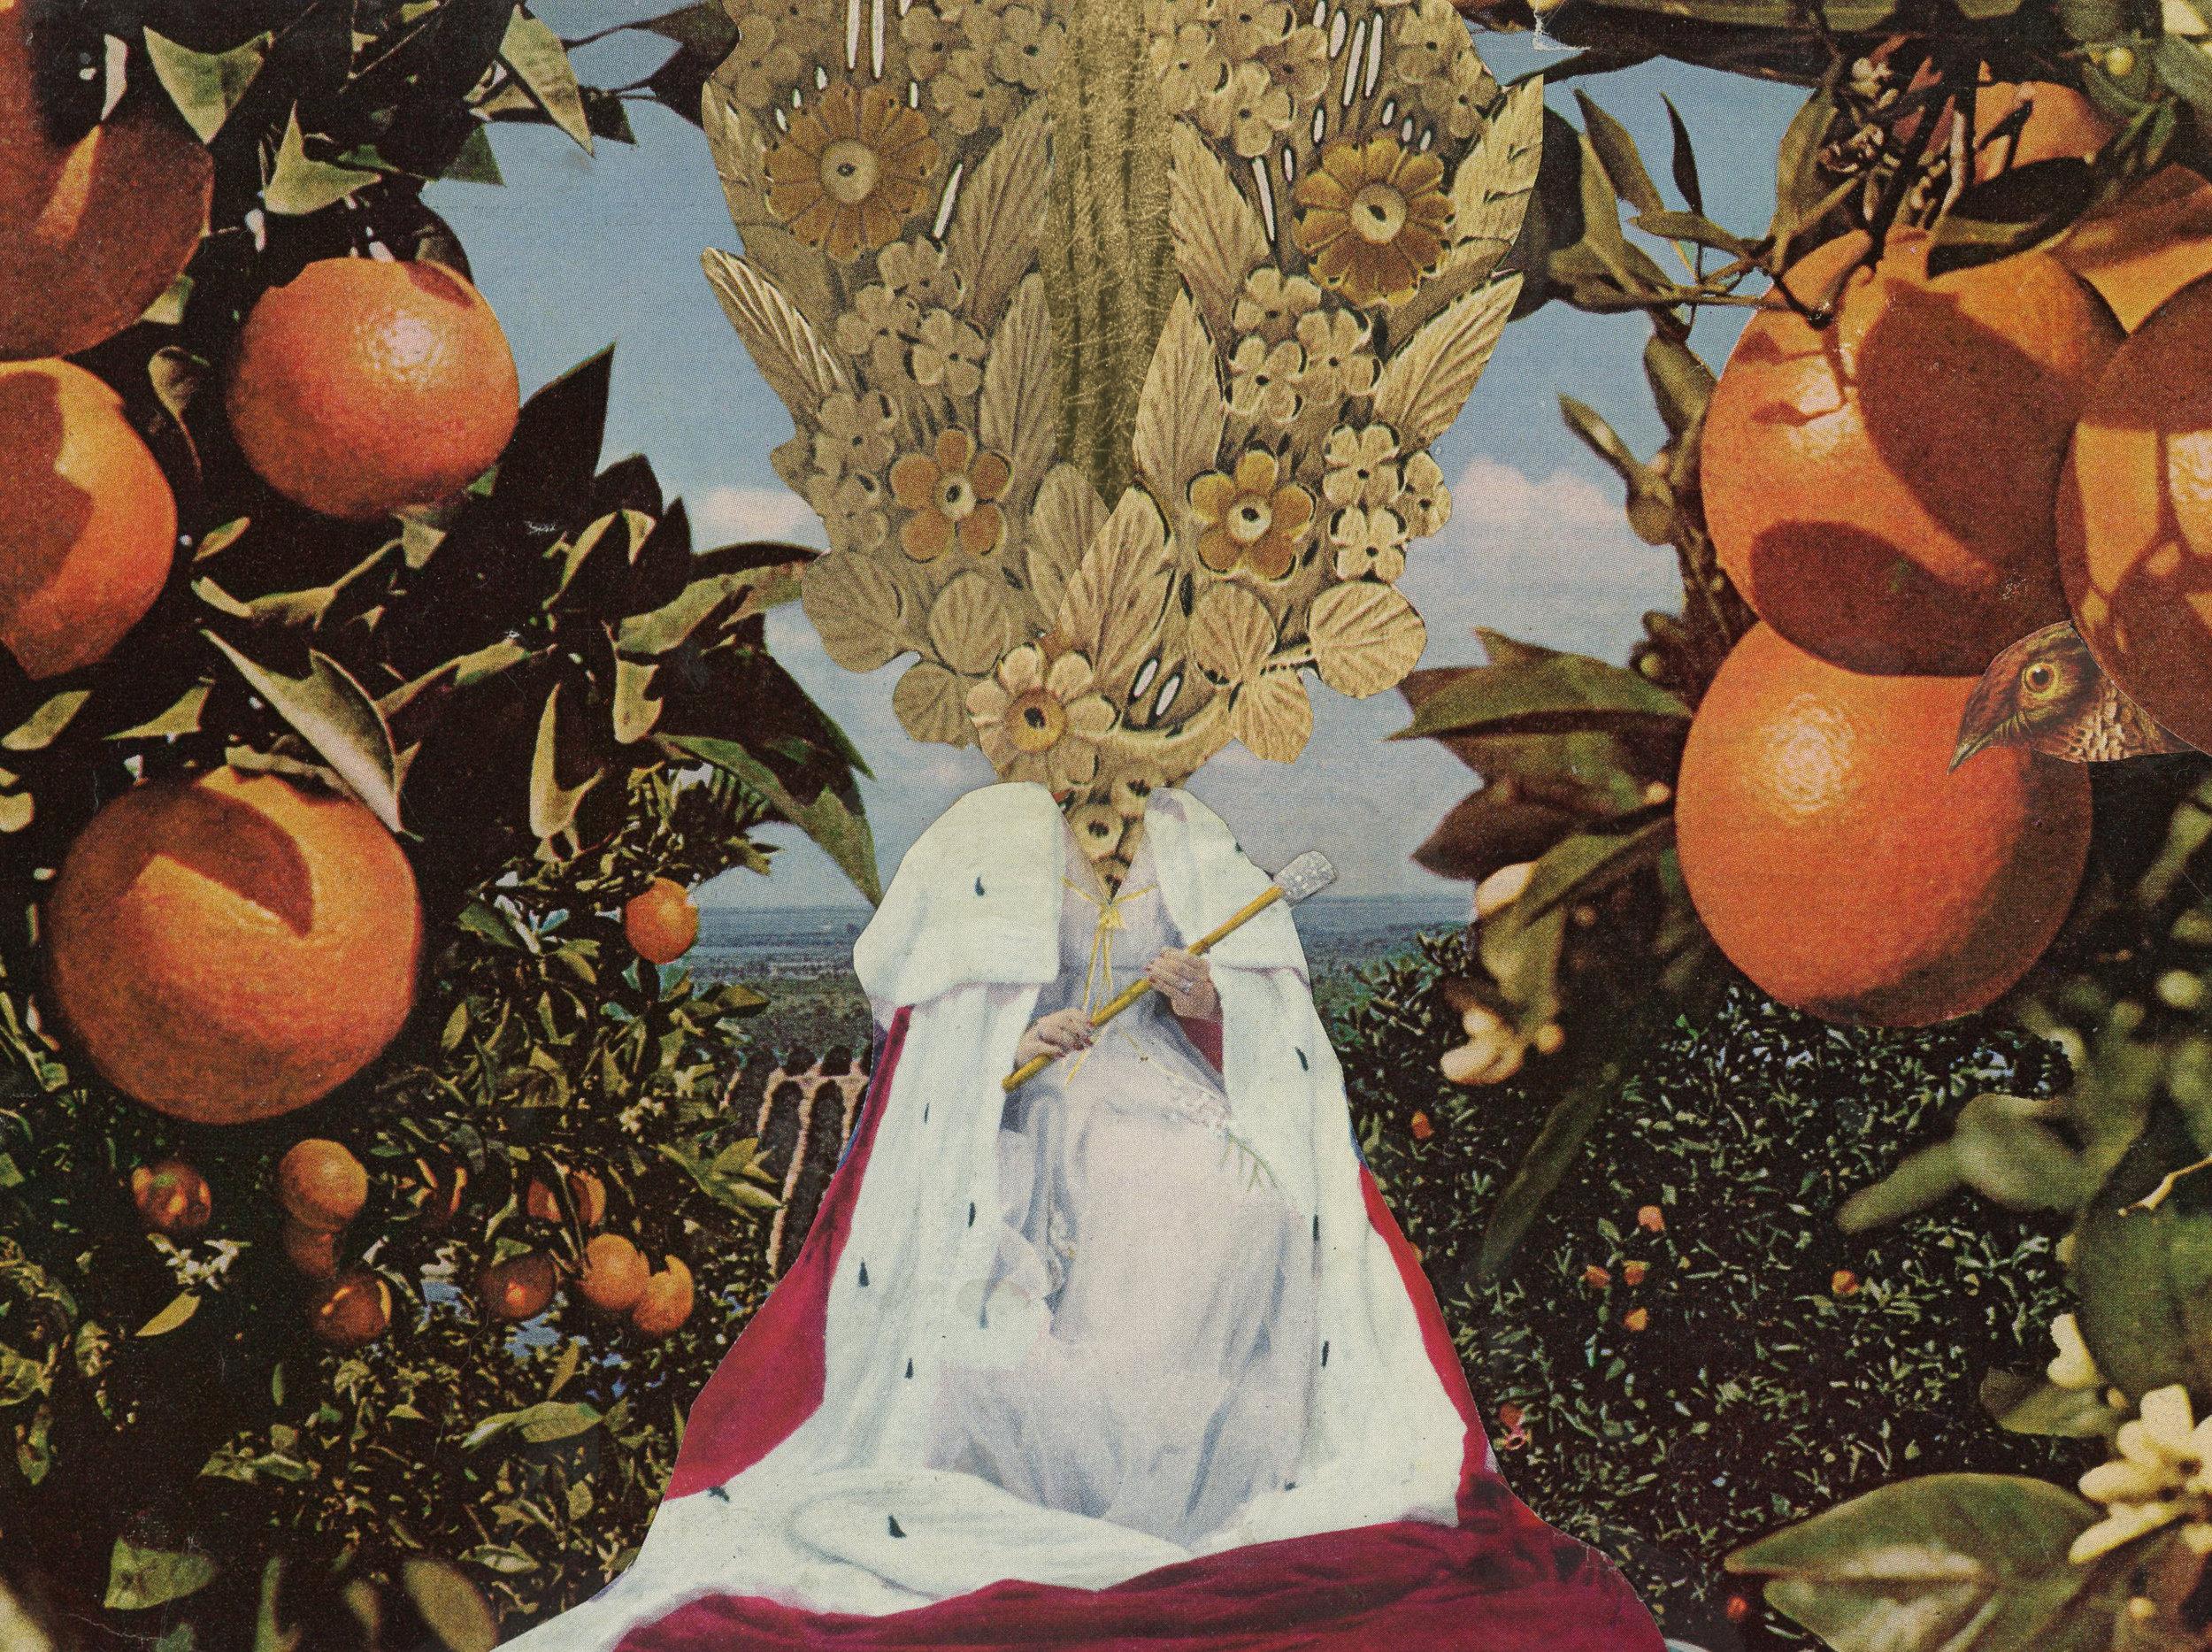 Oranges  by Steve Cline